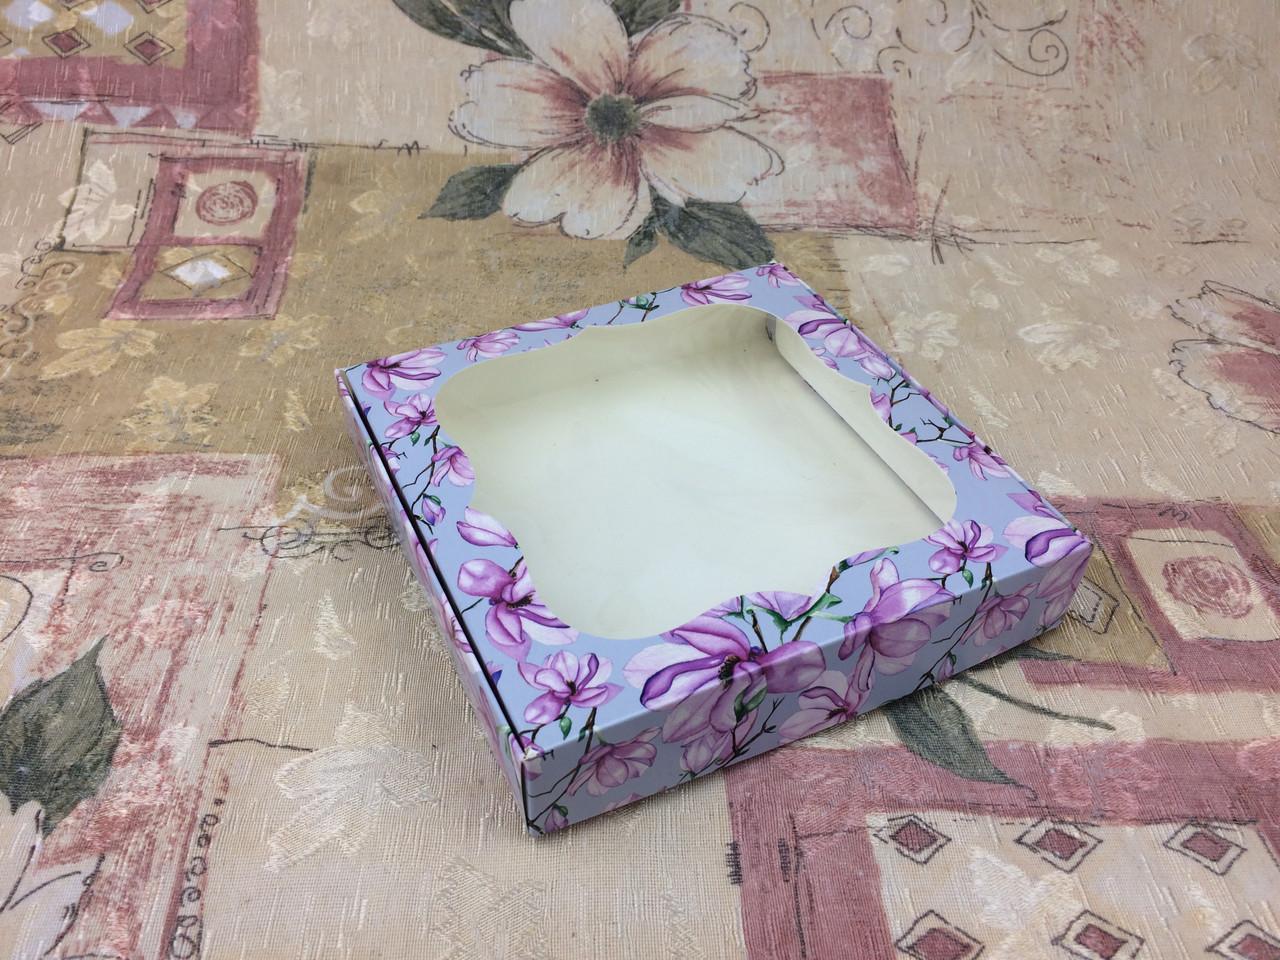 Коробка для пряников / 200х200х30 мм / печать-Магнол / окно-обычн / лк / цв